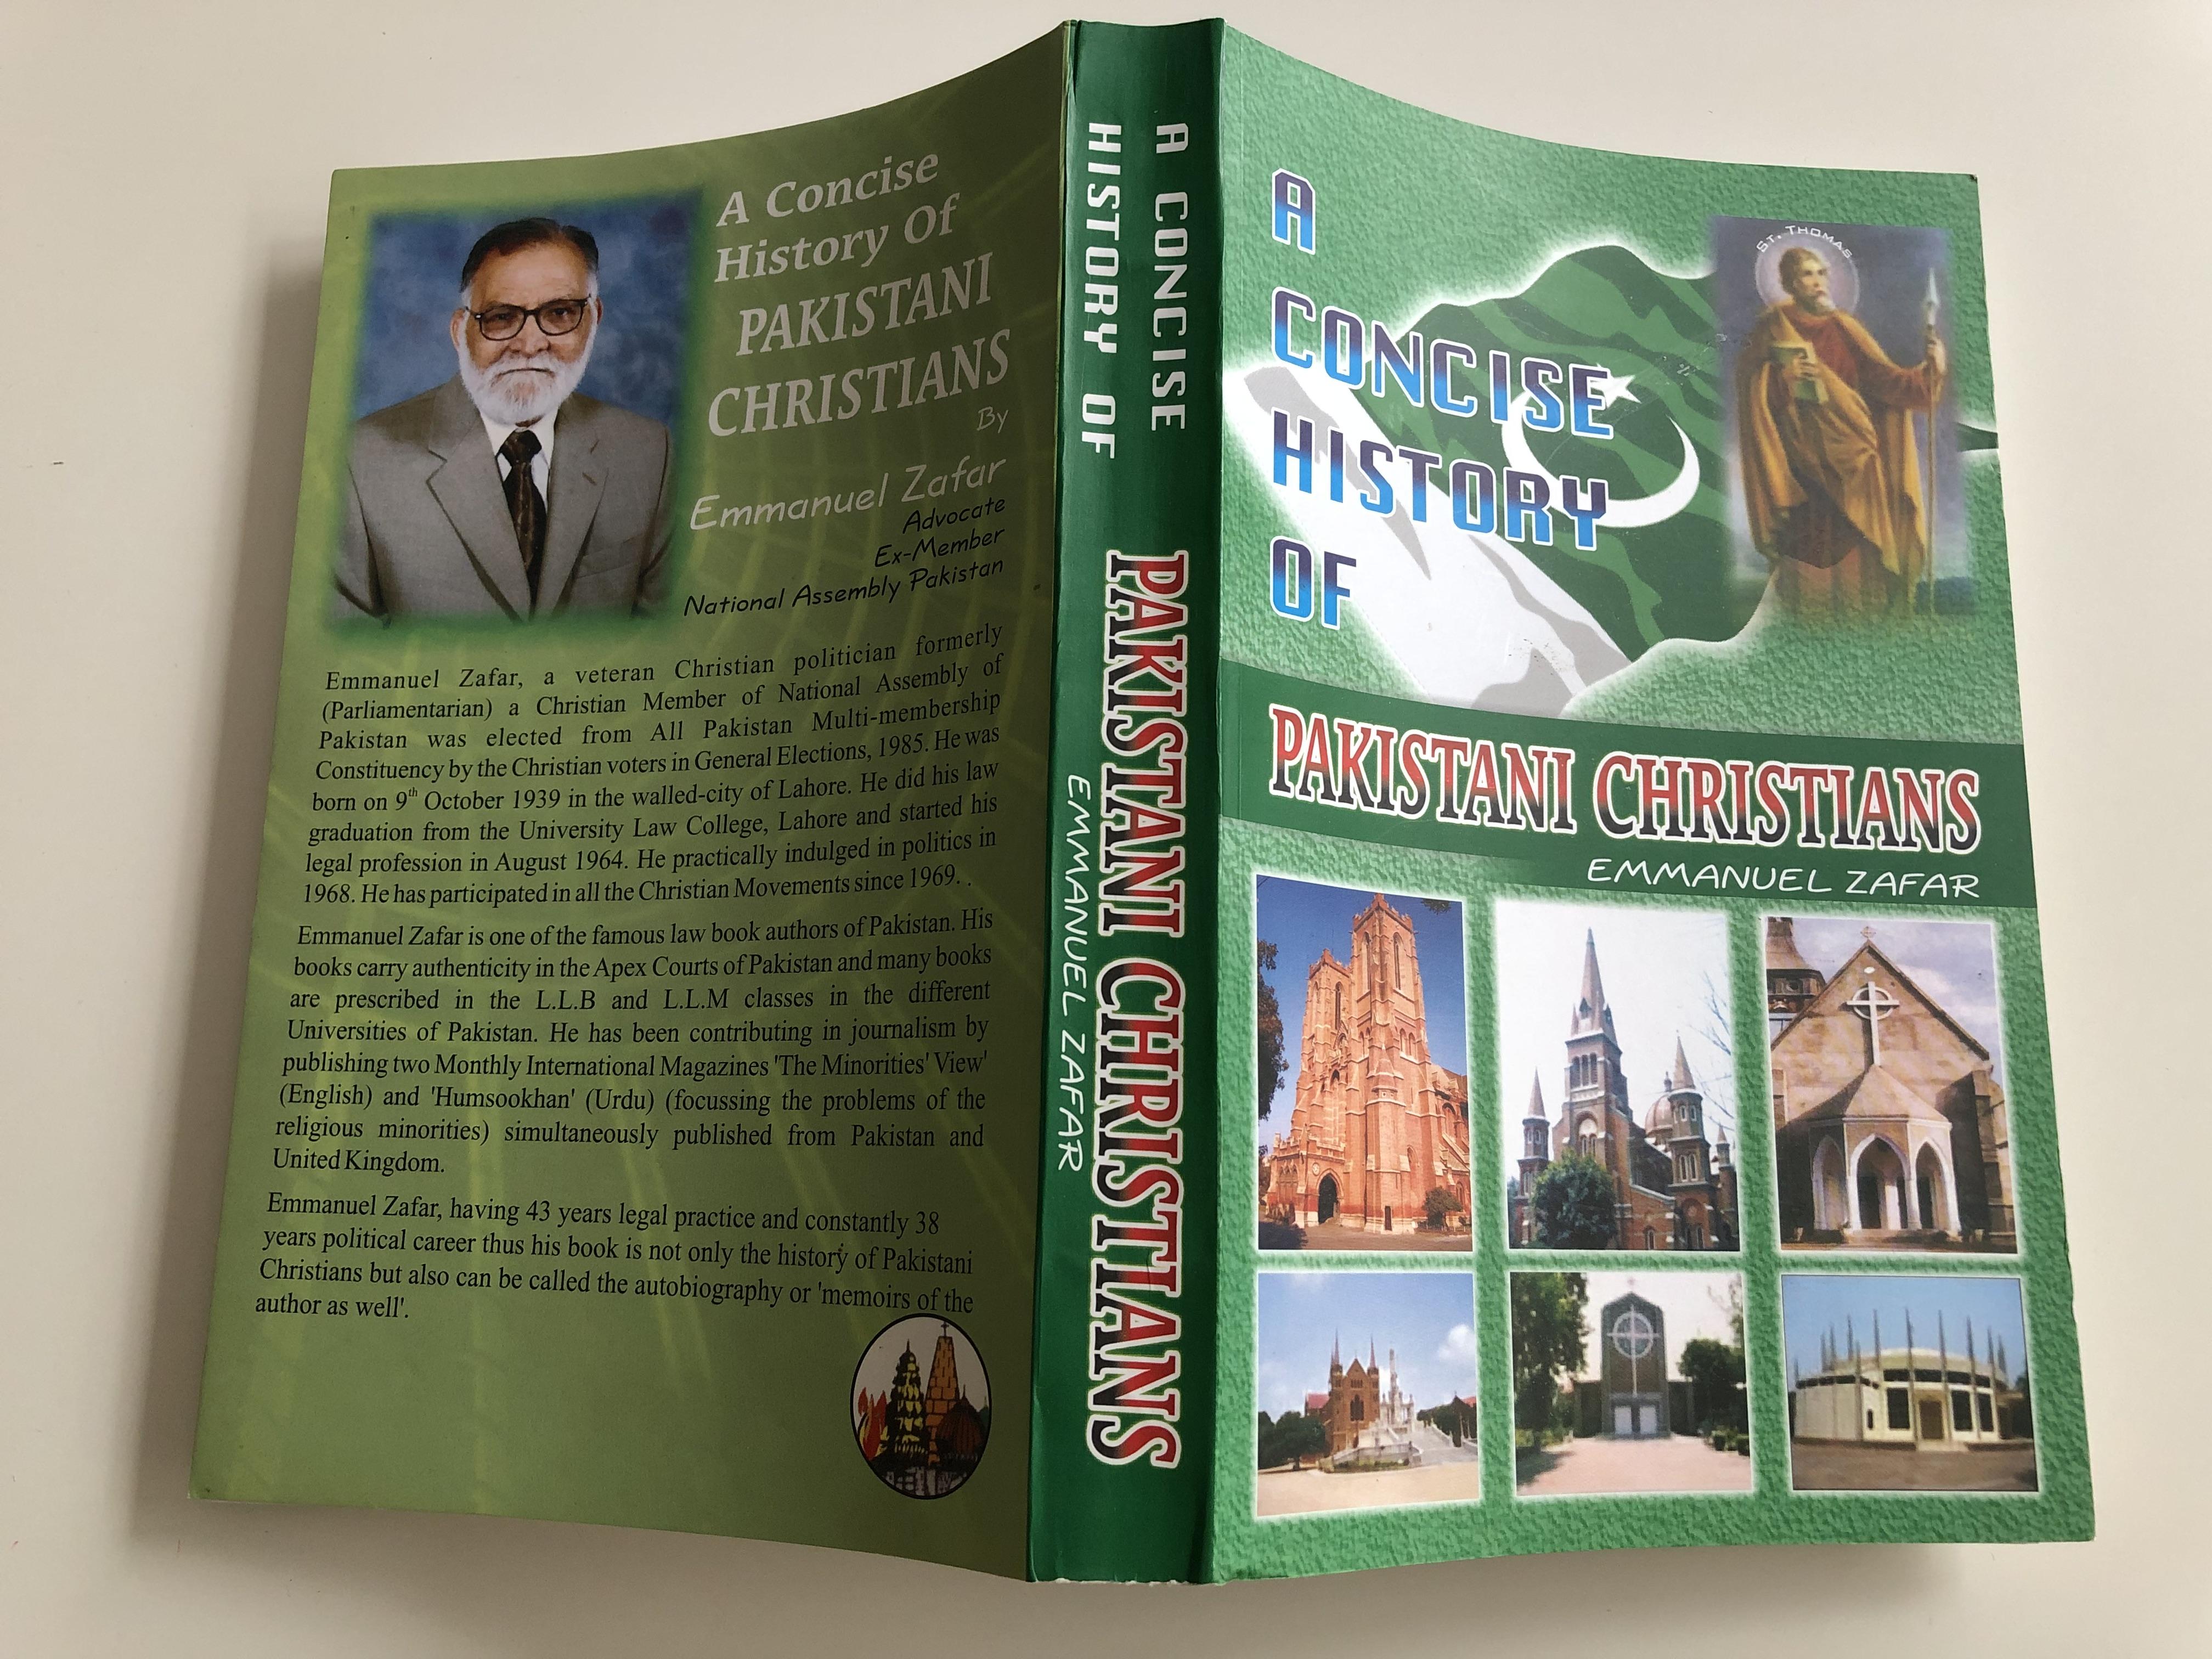 a-concise-history-of-pakistani-christians-by-emmanuel-zafar-humsookhan-publication-paperback-2007-21-.jpg